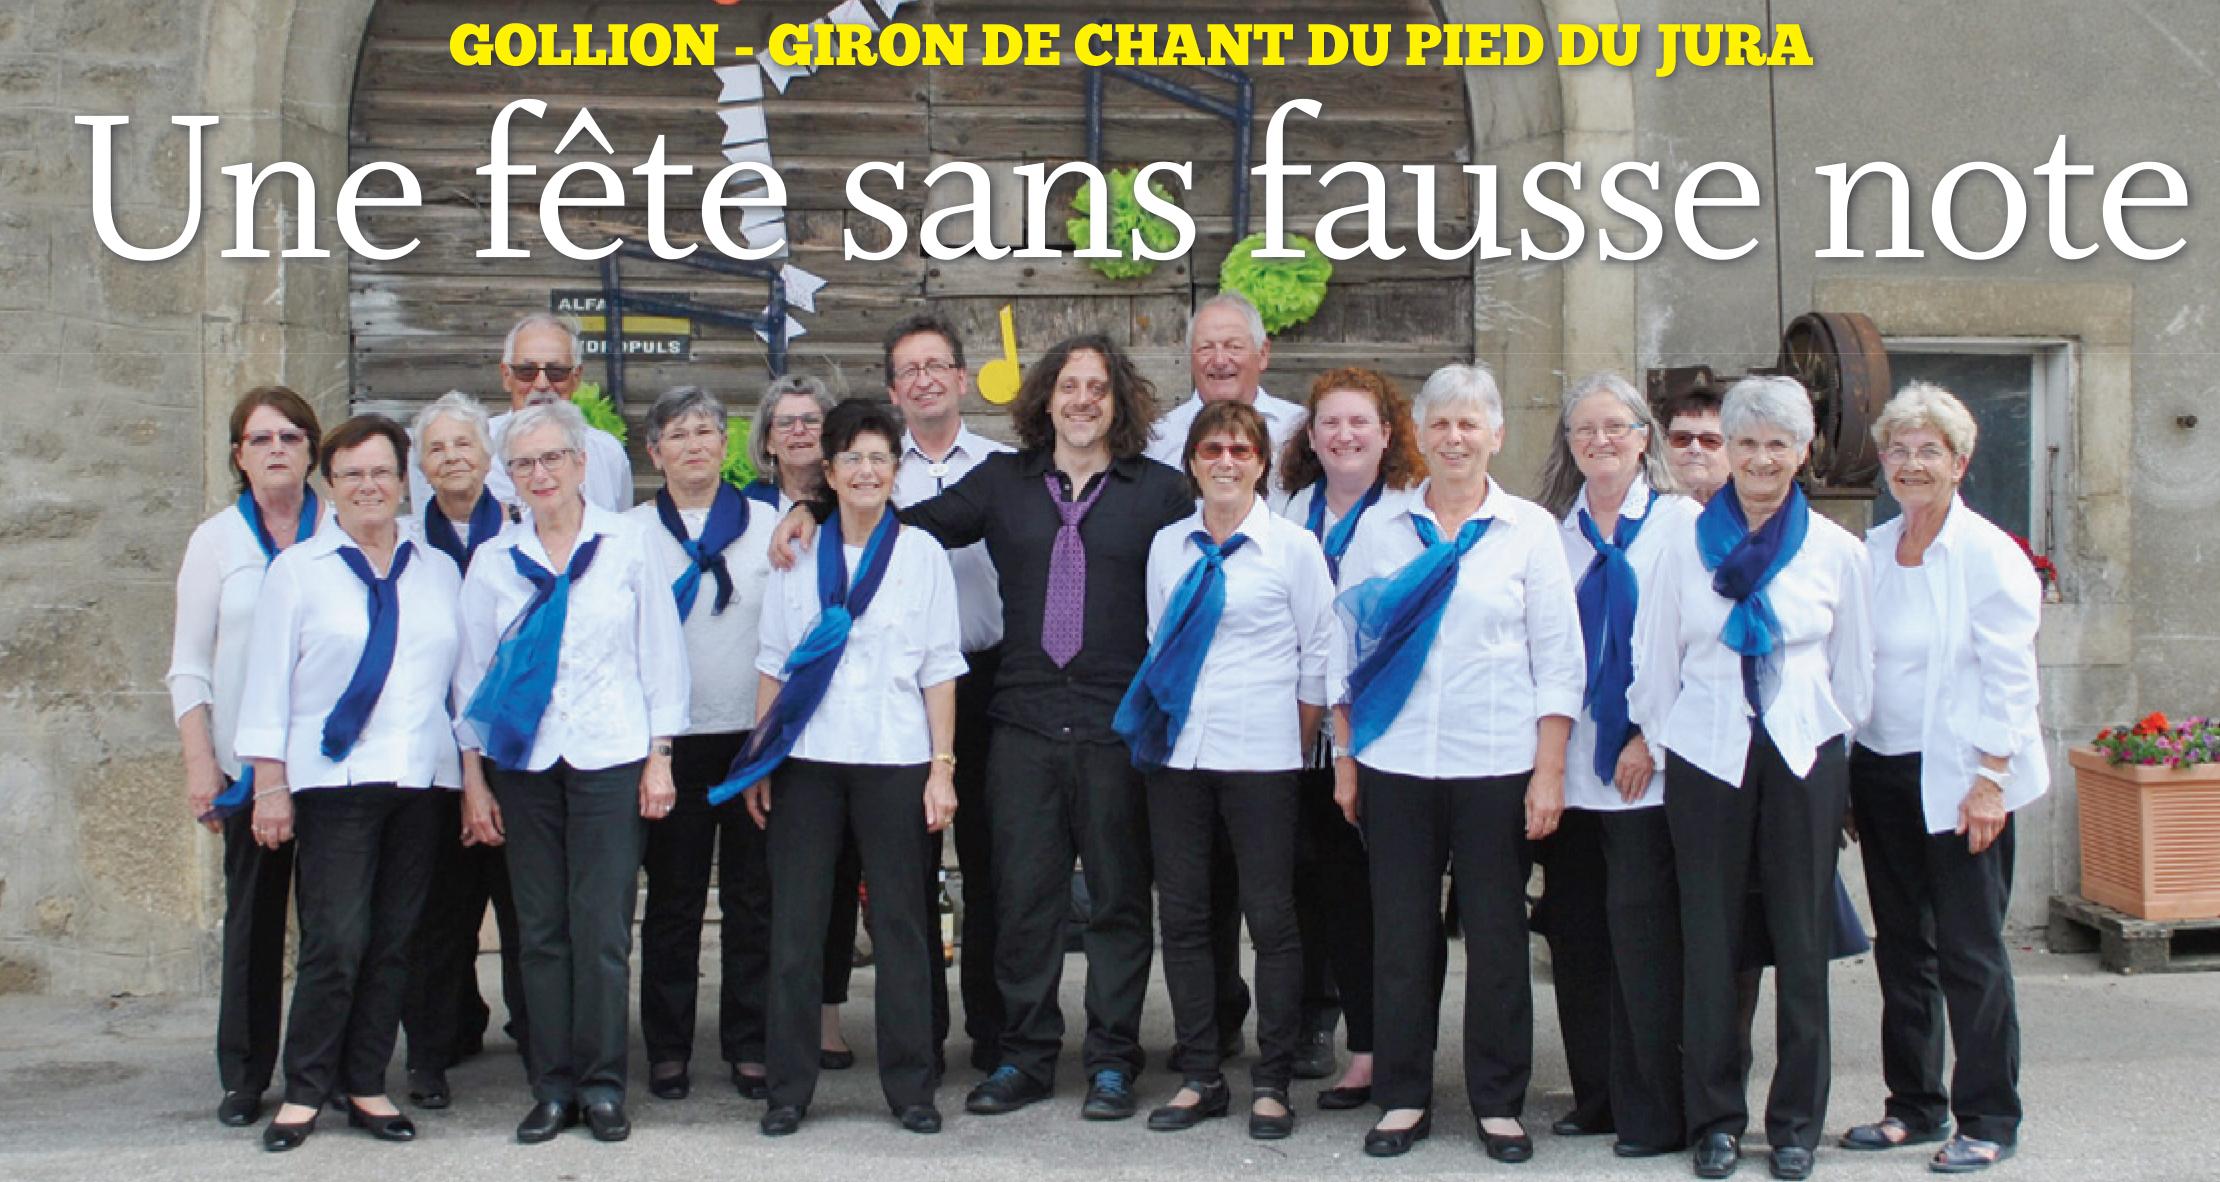 Gollion, Giron de Chant du Pied du Jura